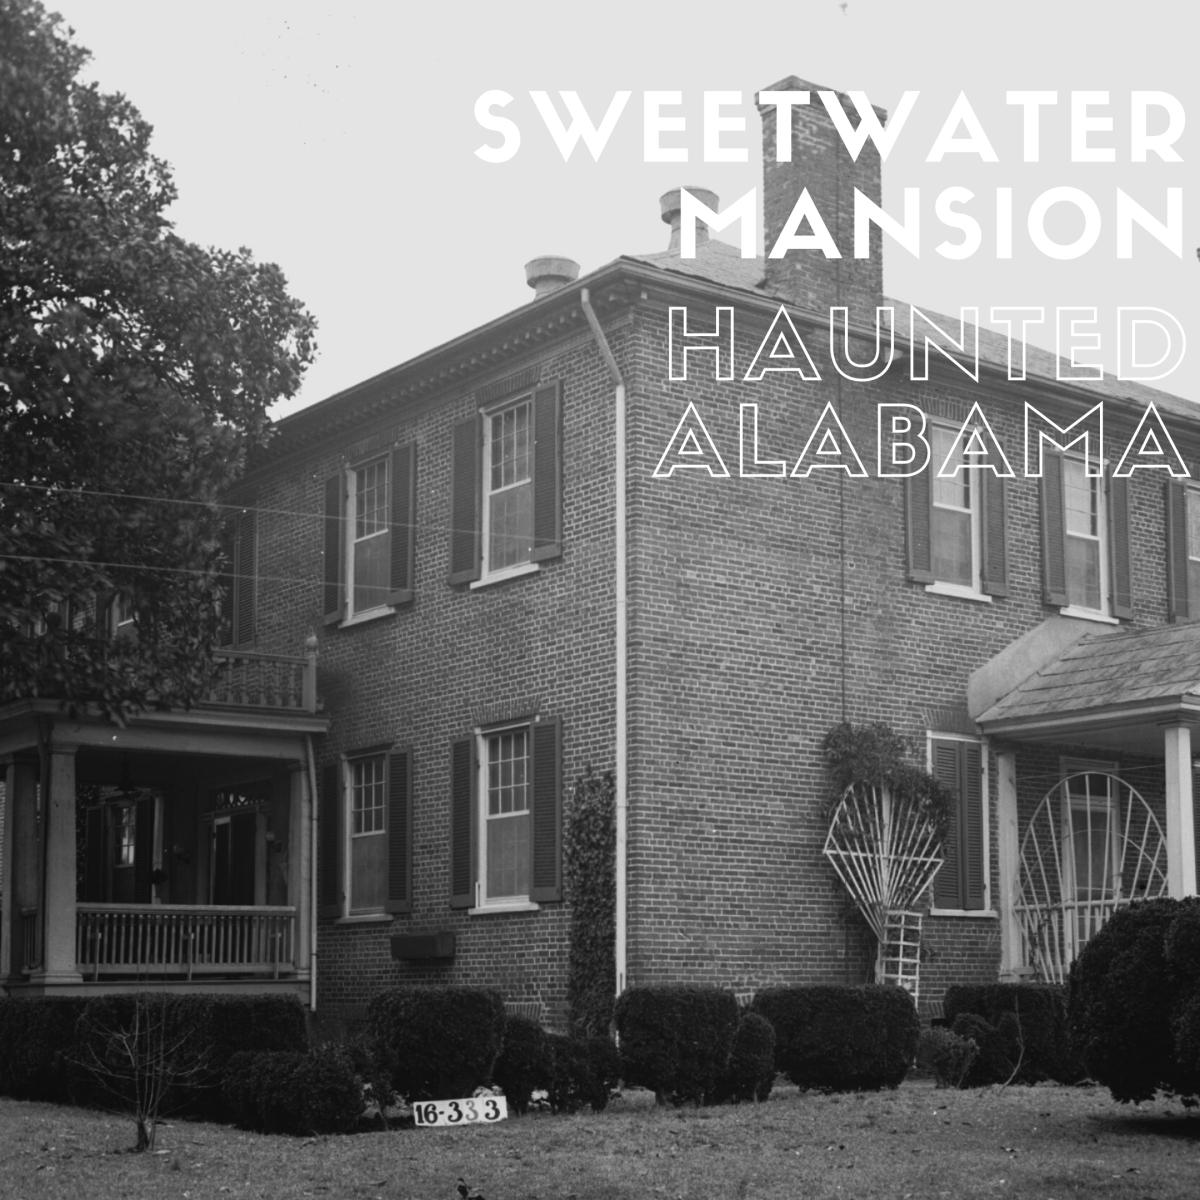 Sweetwater Mansion - Haunted Alabama